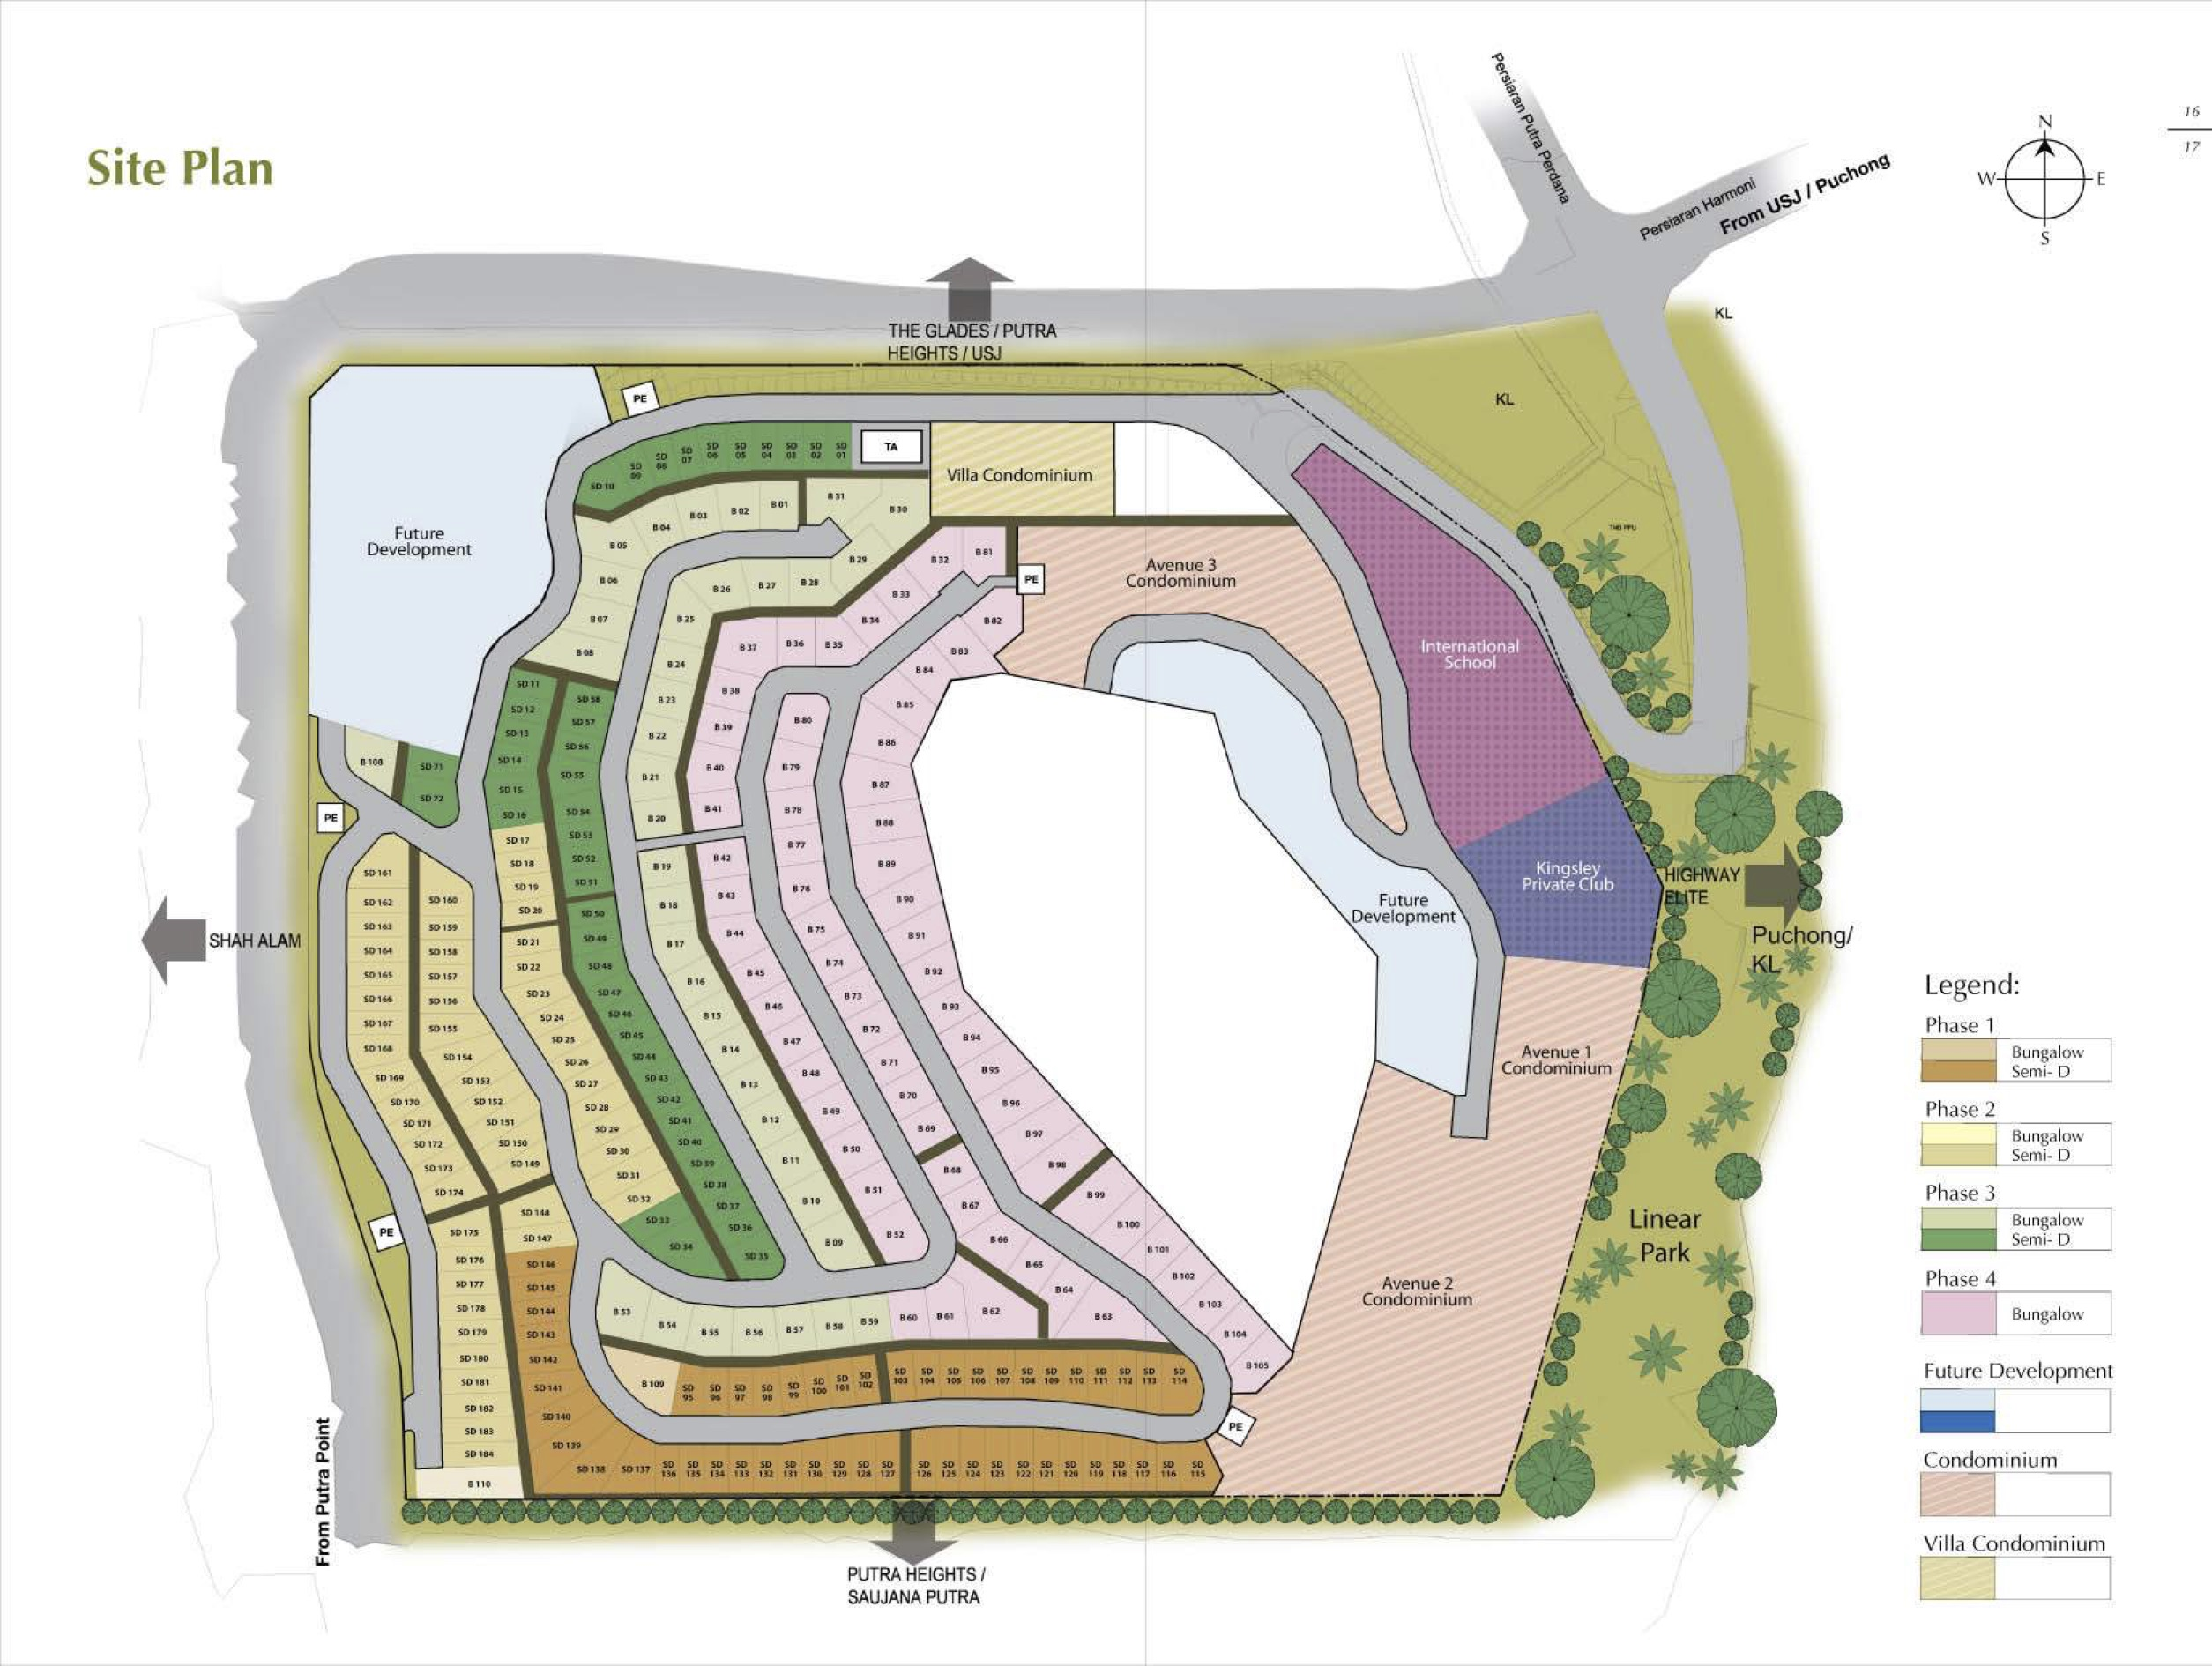 Site Plan of Kingsley Hills